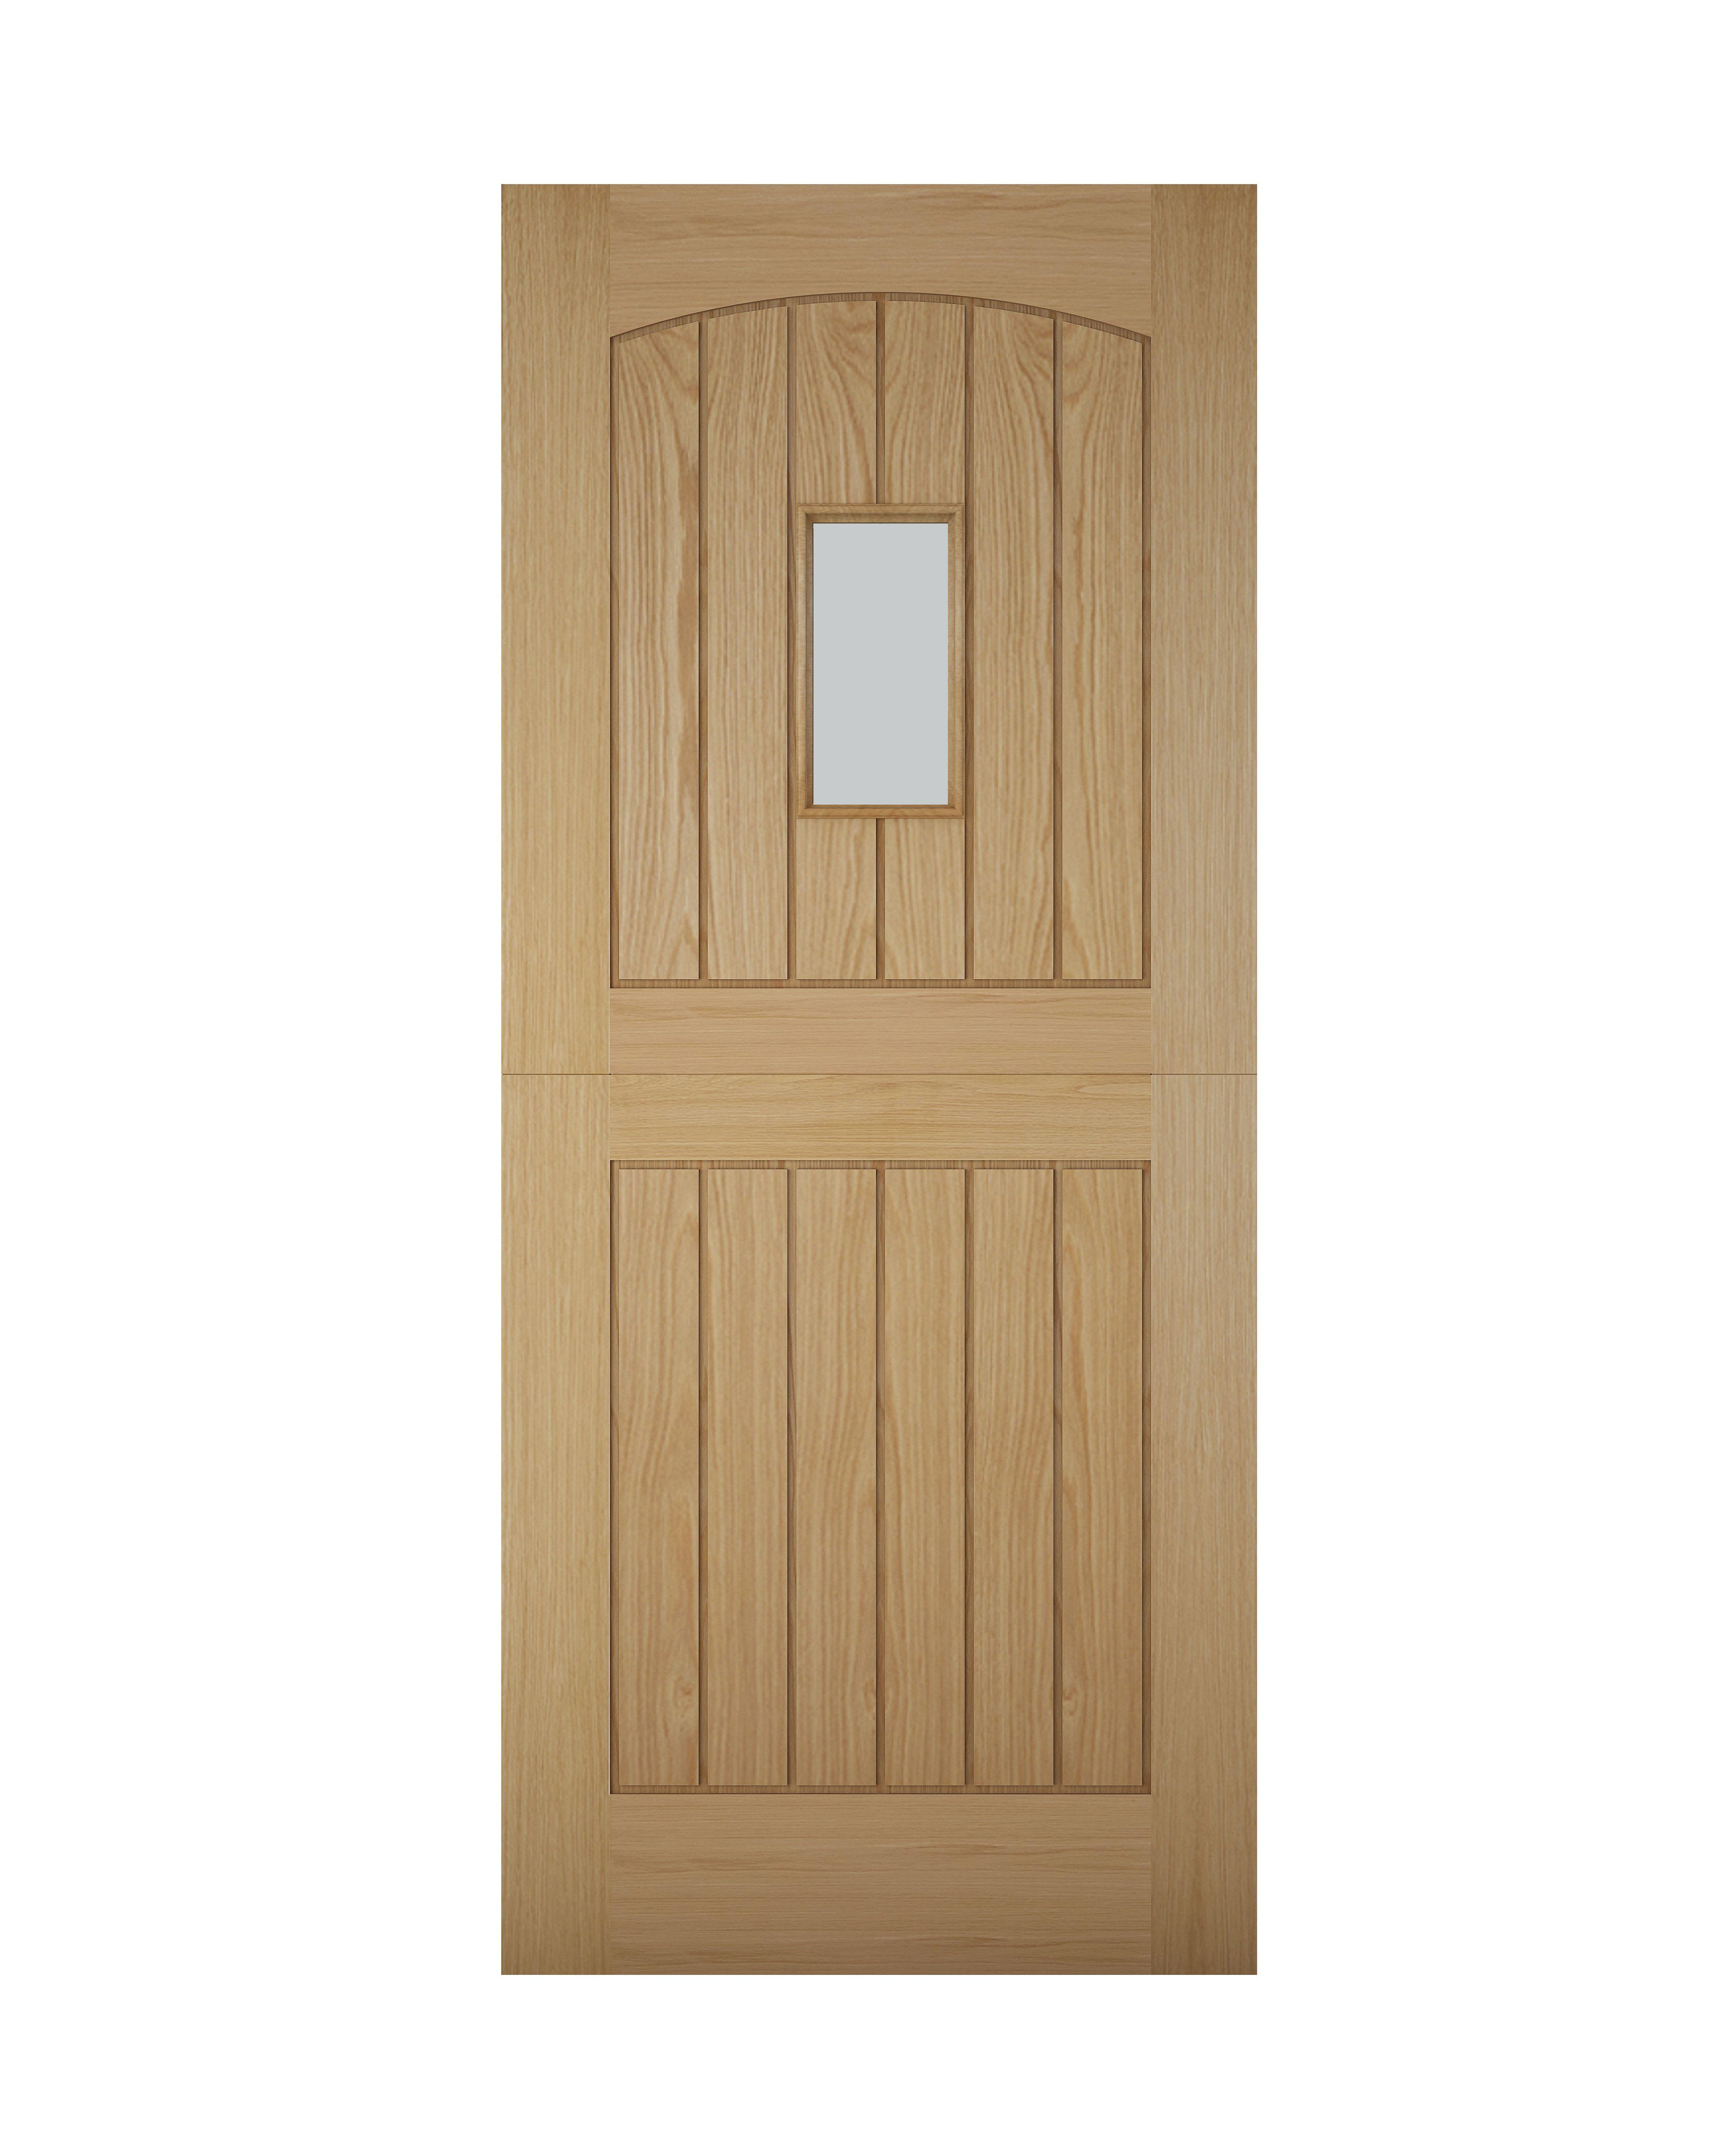 Cottage Stable Panelled White Oak Veneer Glazed Front Door, (h)2032mm (w)813mm